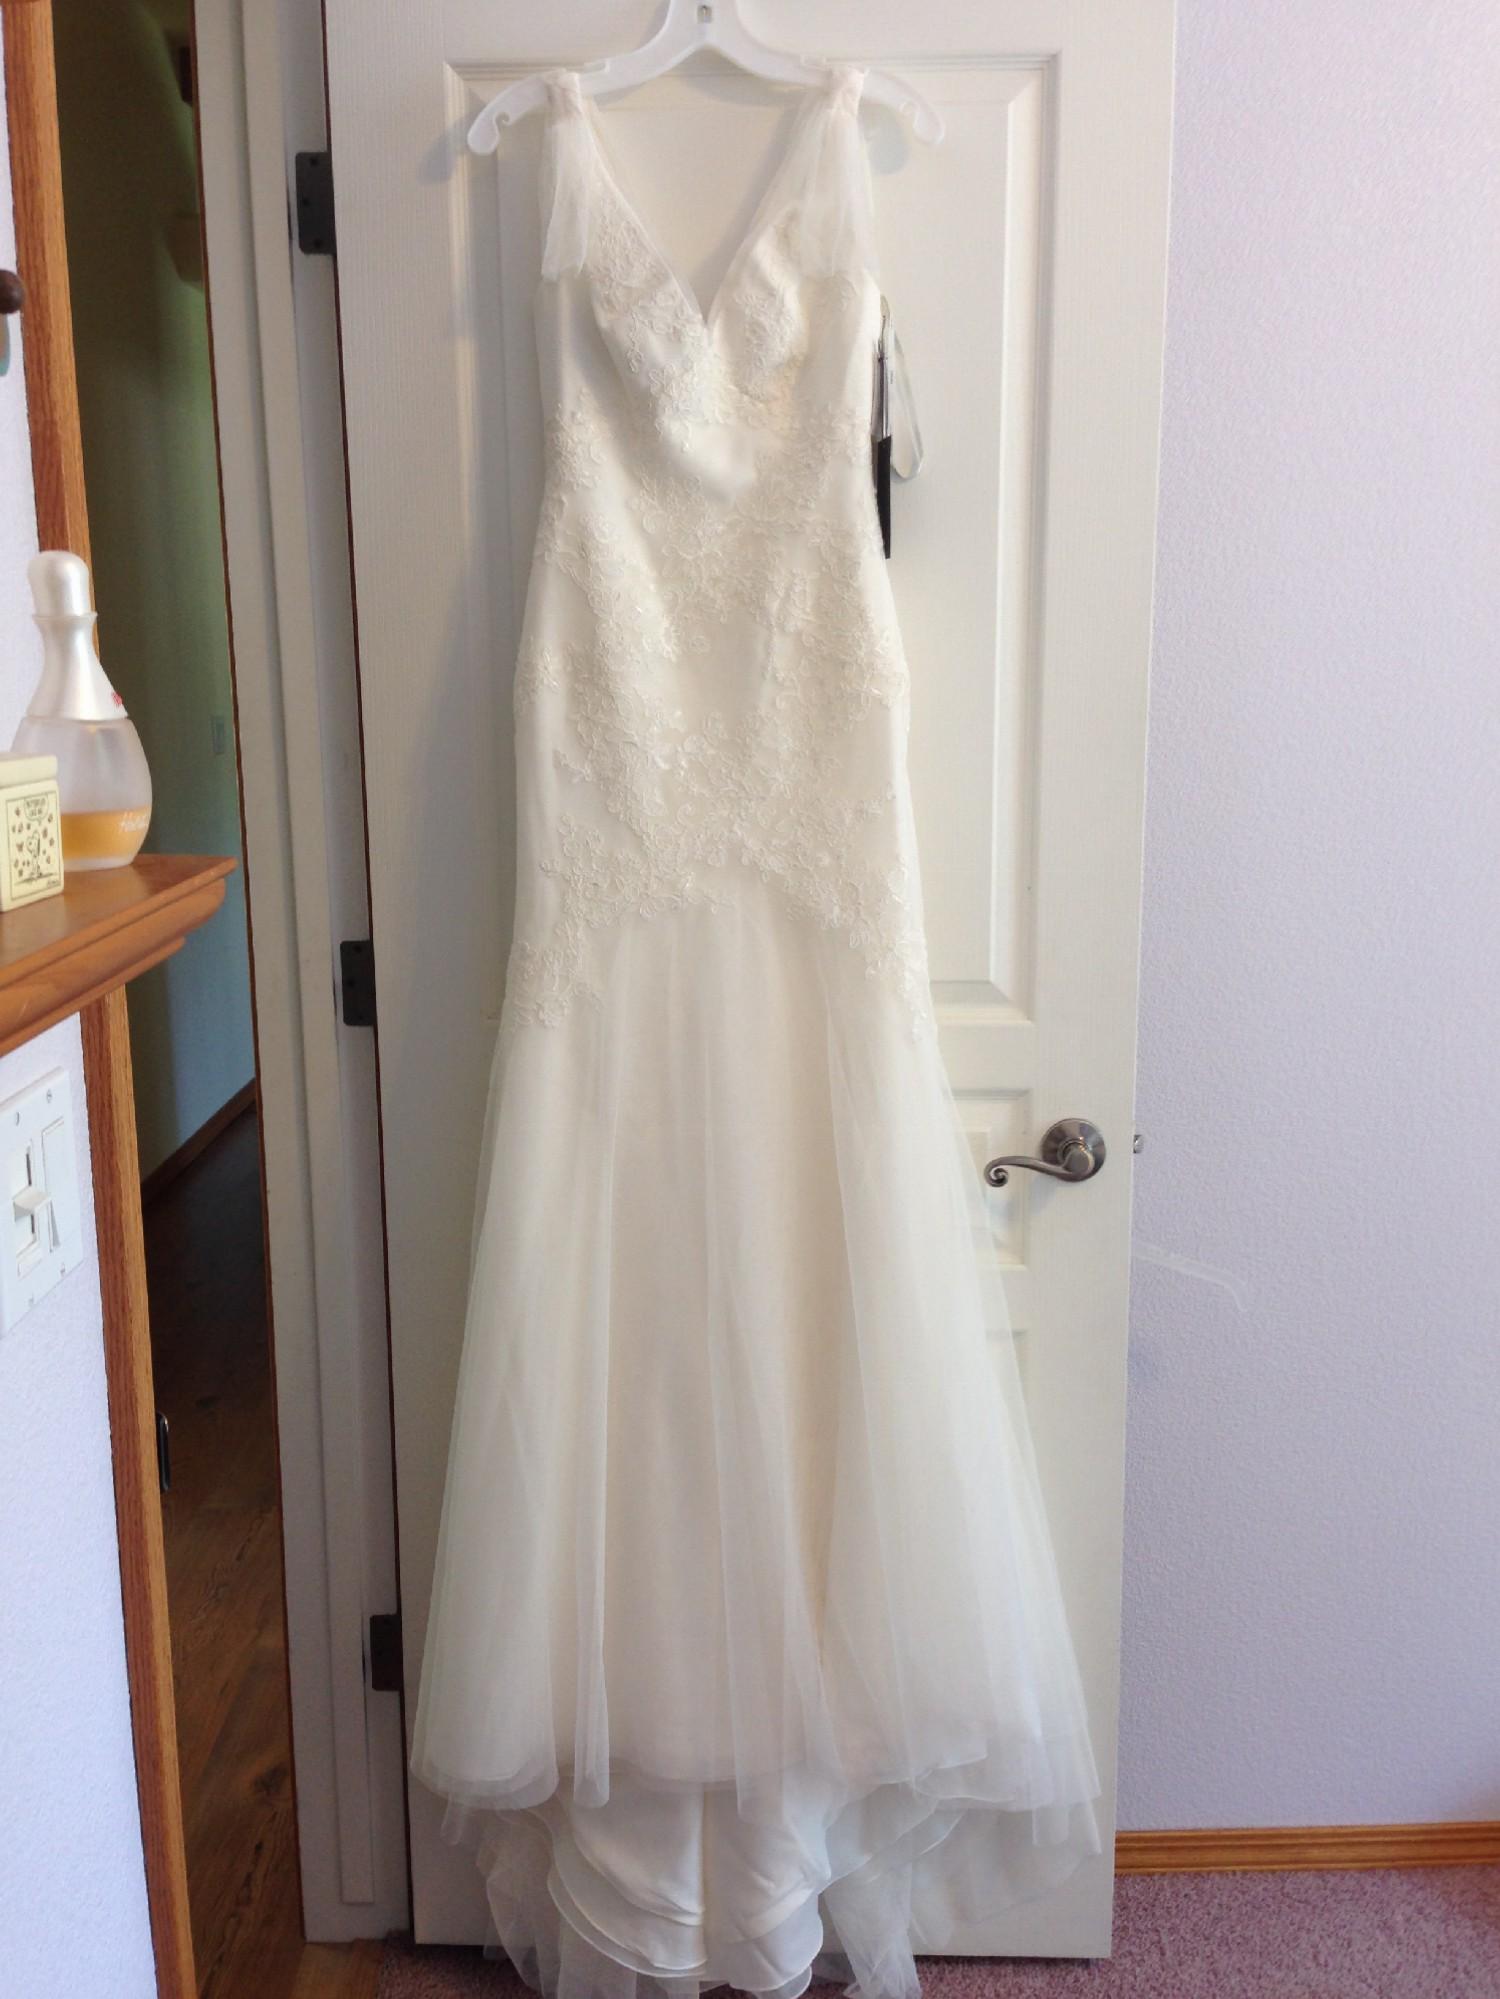 2c5fb7d51944 Vera Wang VW351021 New Wedding Dress on Sale 38% Off - Stillwhite United  Kingdom